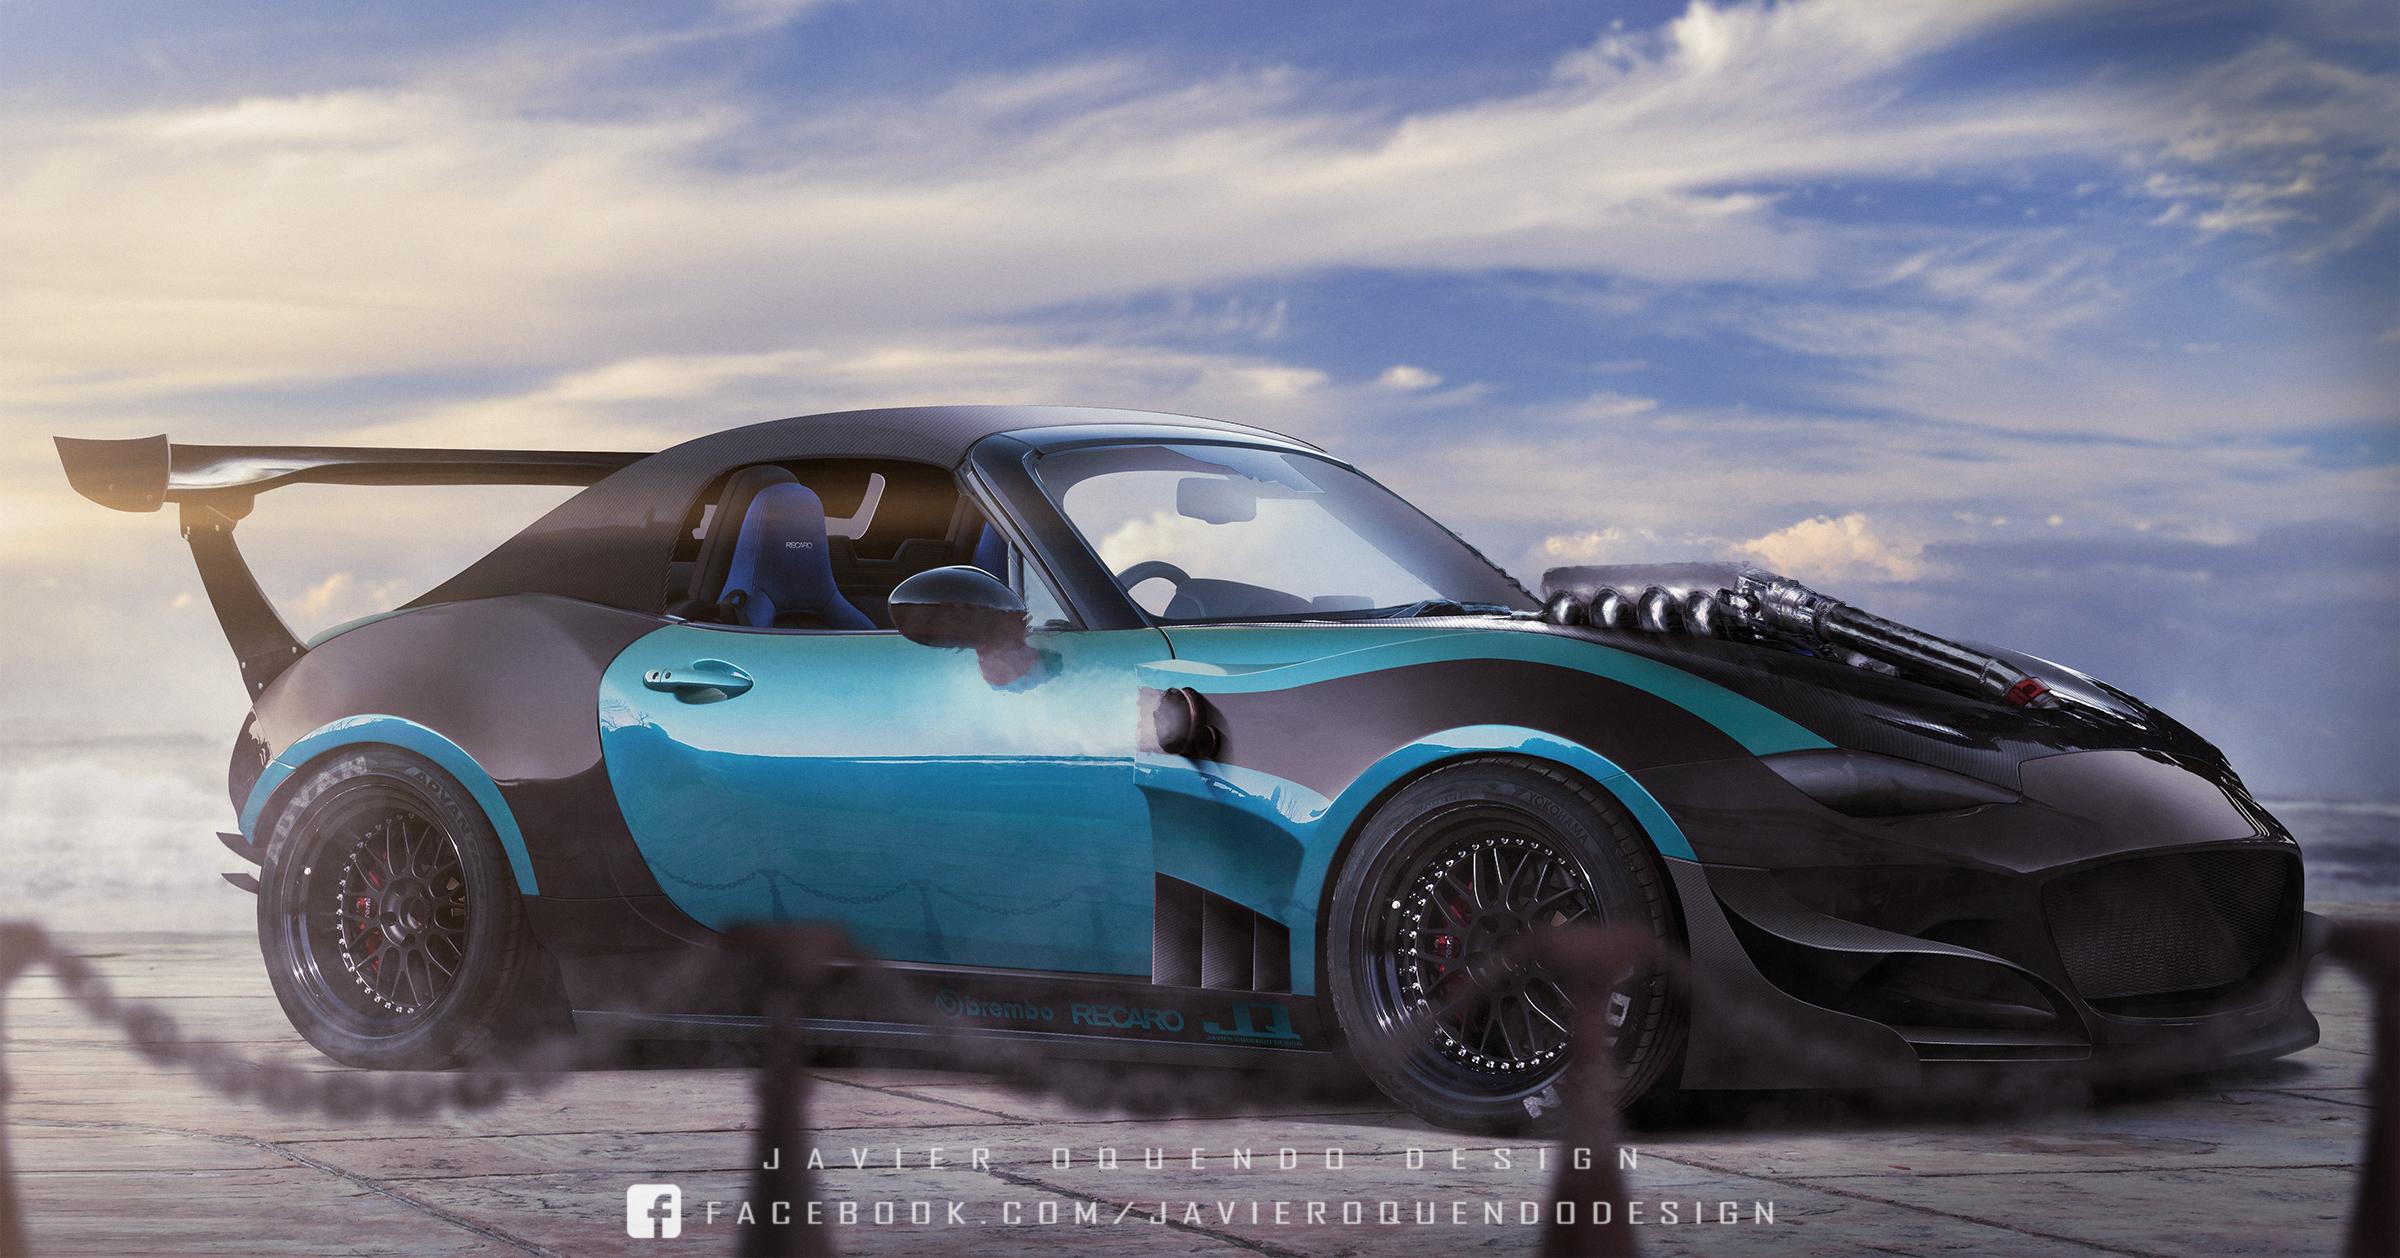 Miata with poppy art car livery isn t just for show autoevolution - Filename V8_turbo_miata_by_javieroquendodesign D9jv2i2 Jpg